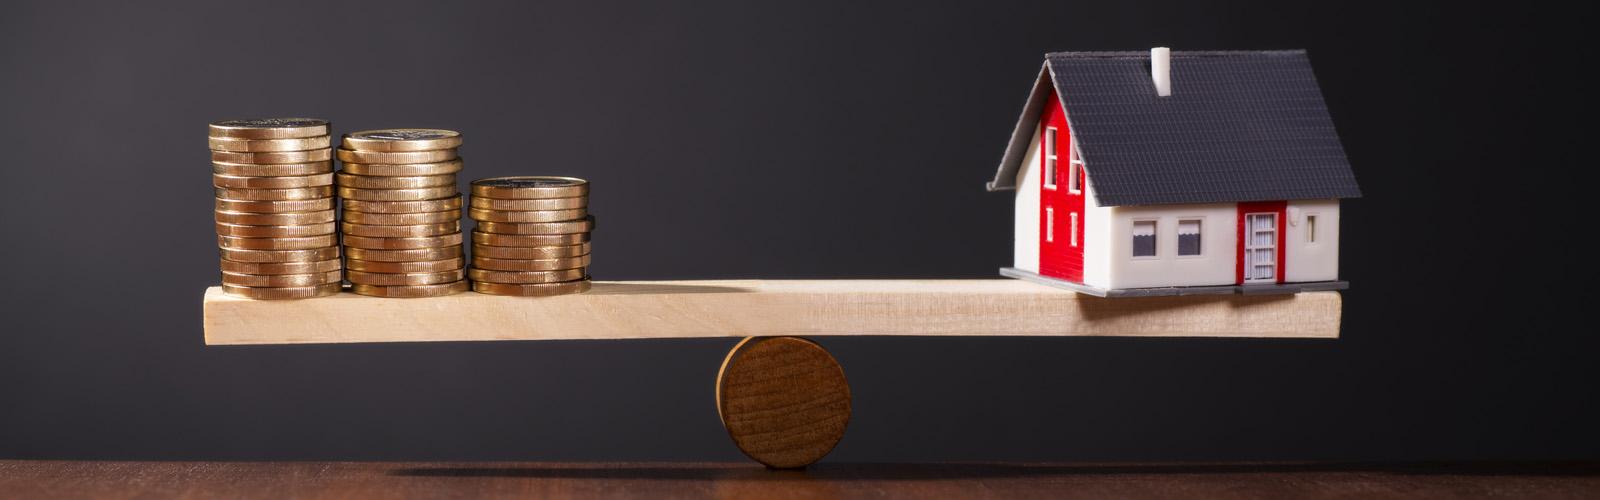 Daniel Kieck Immobilien - Wir bewerten Ihre Immobilie marktgerecht